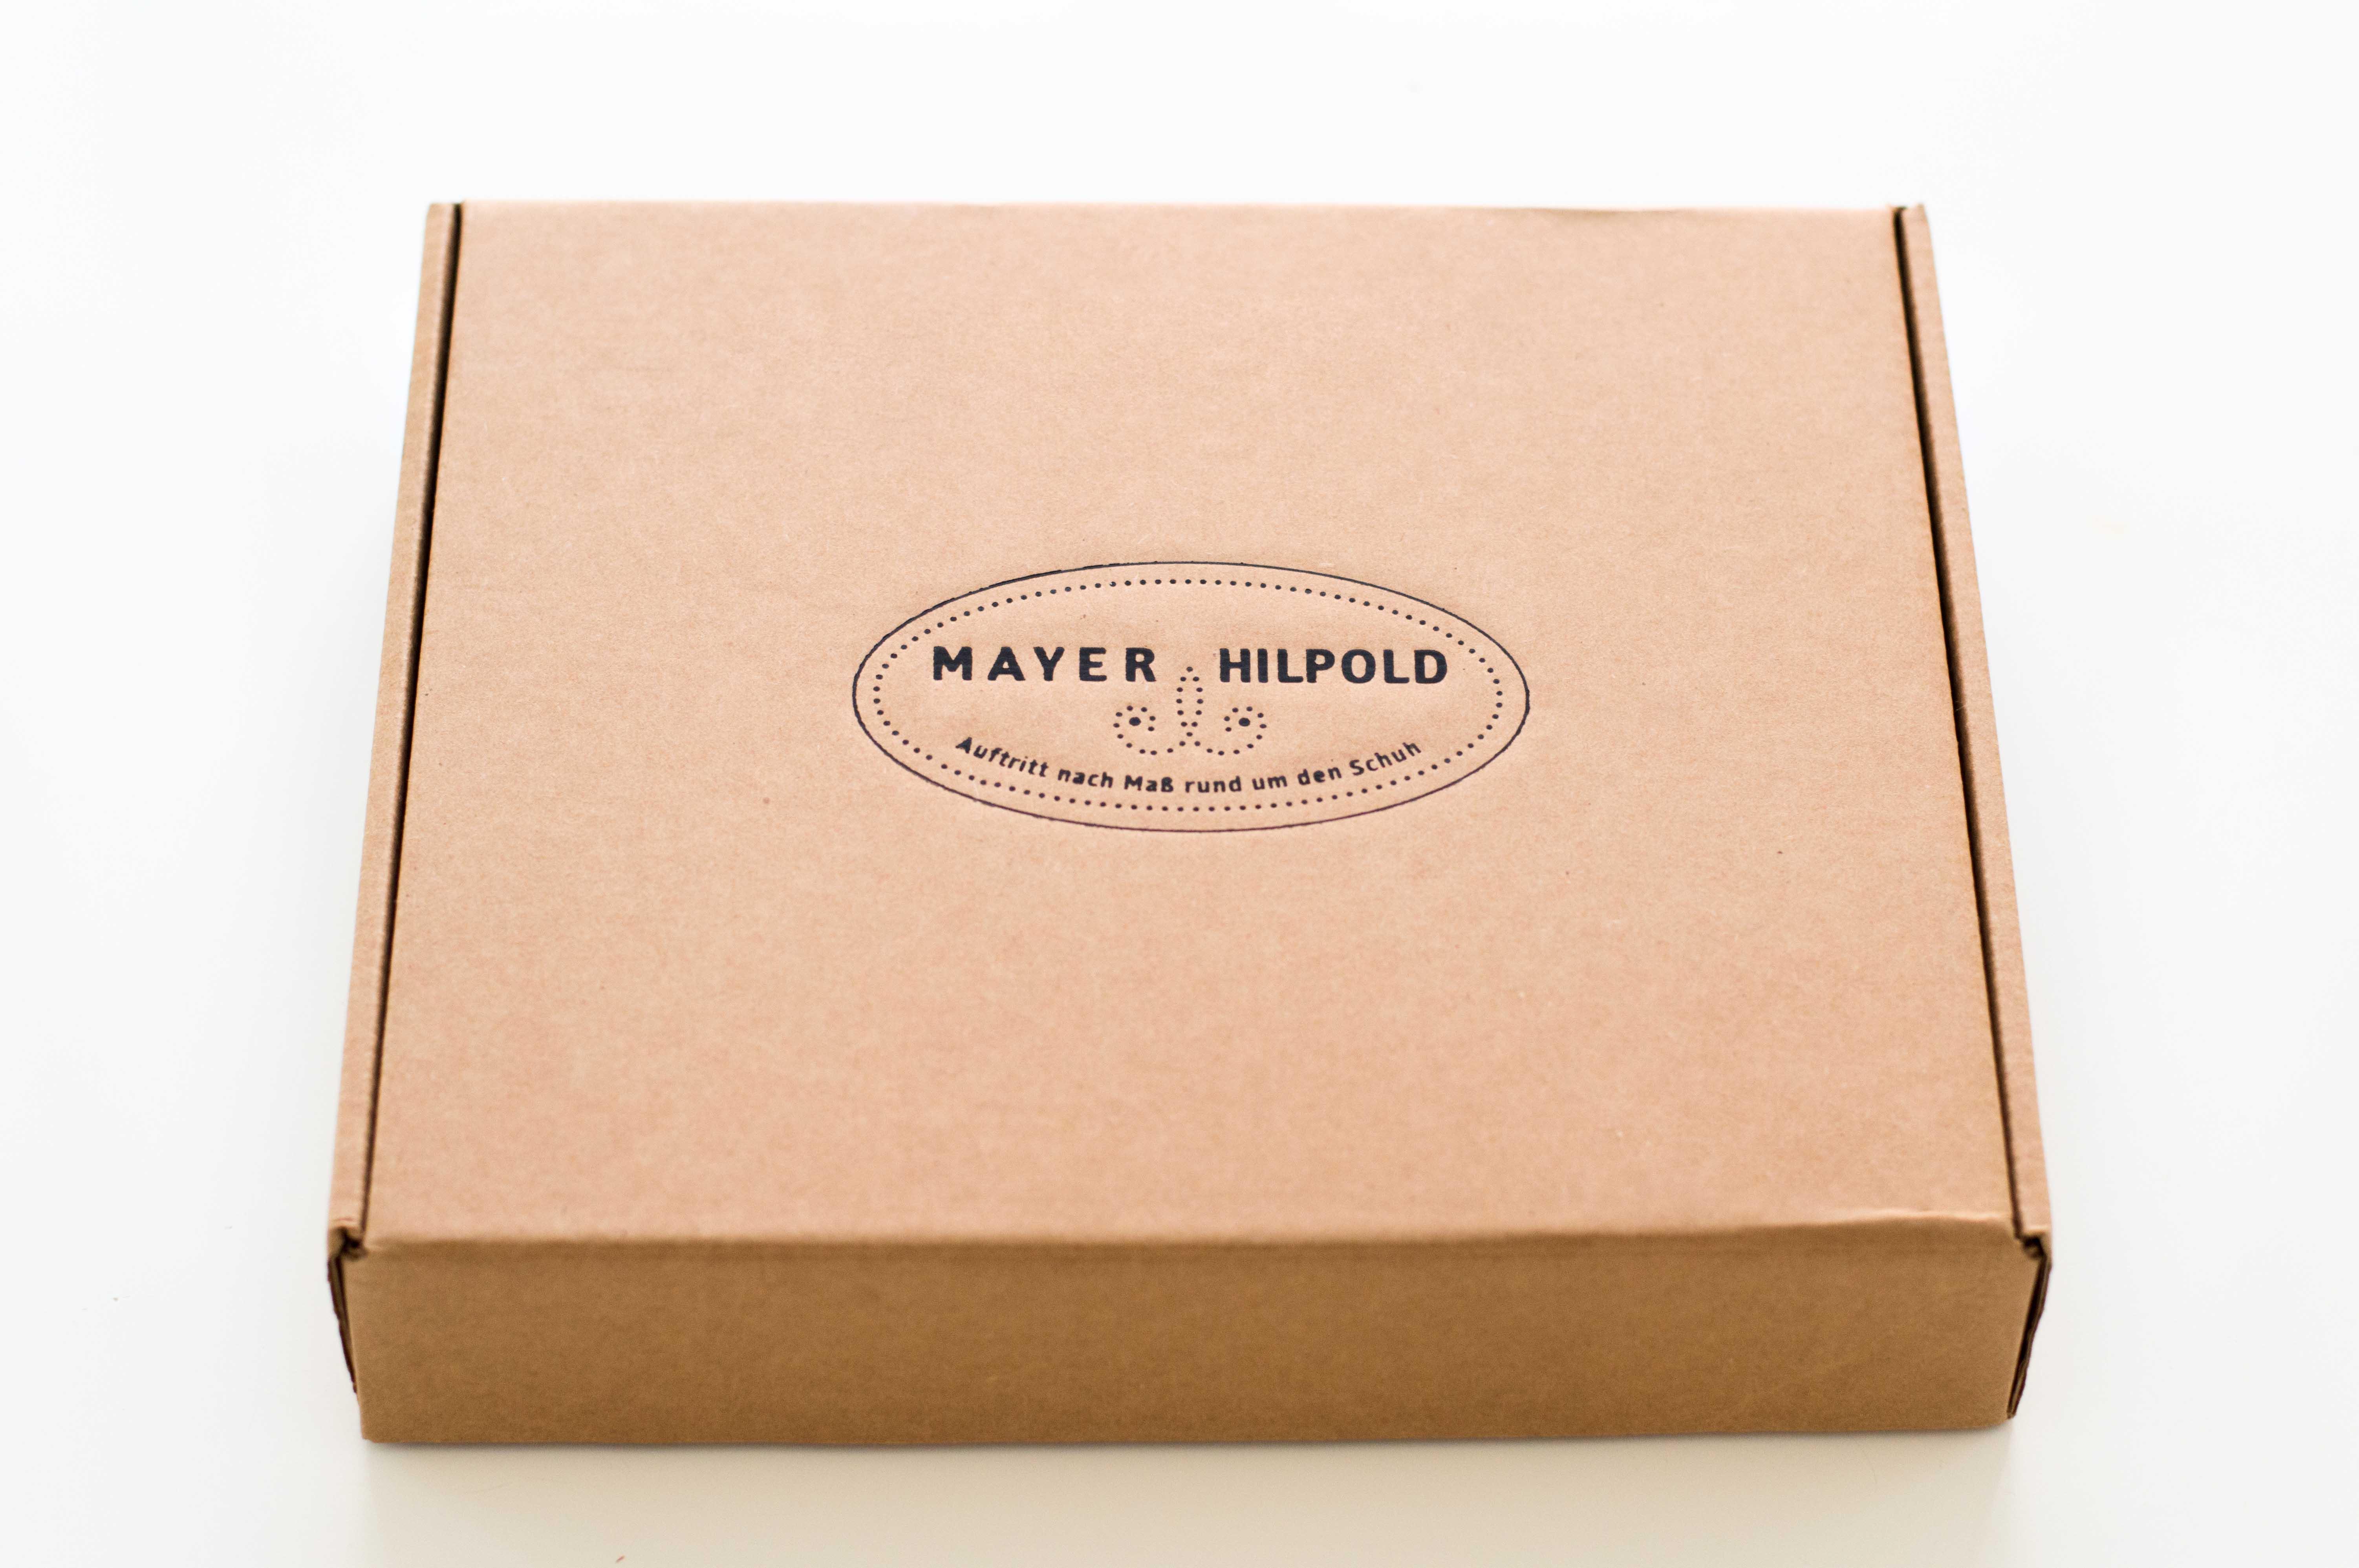 mayer-hilpol-schnürsenkel-box